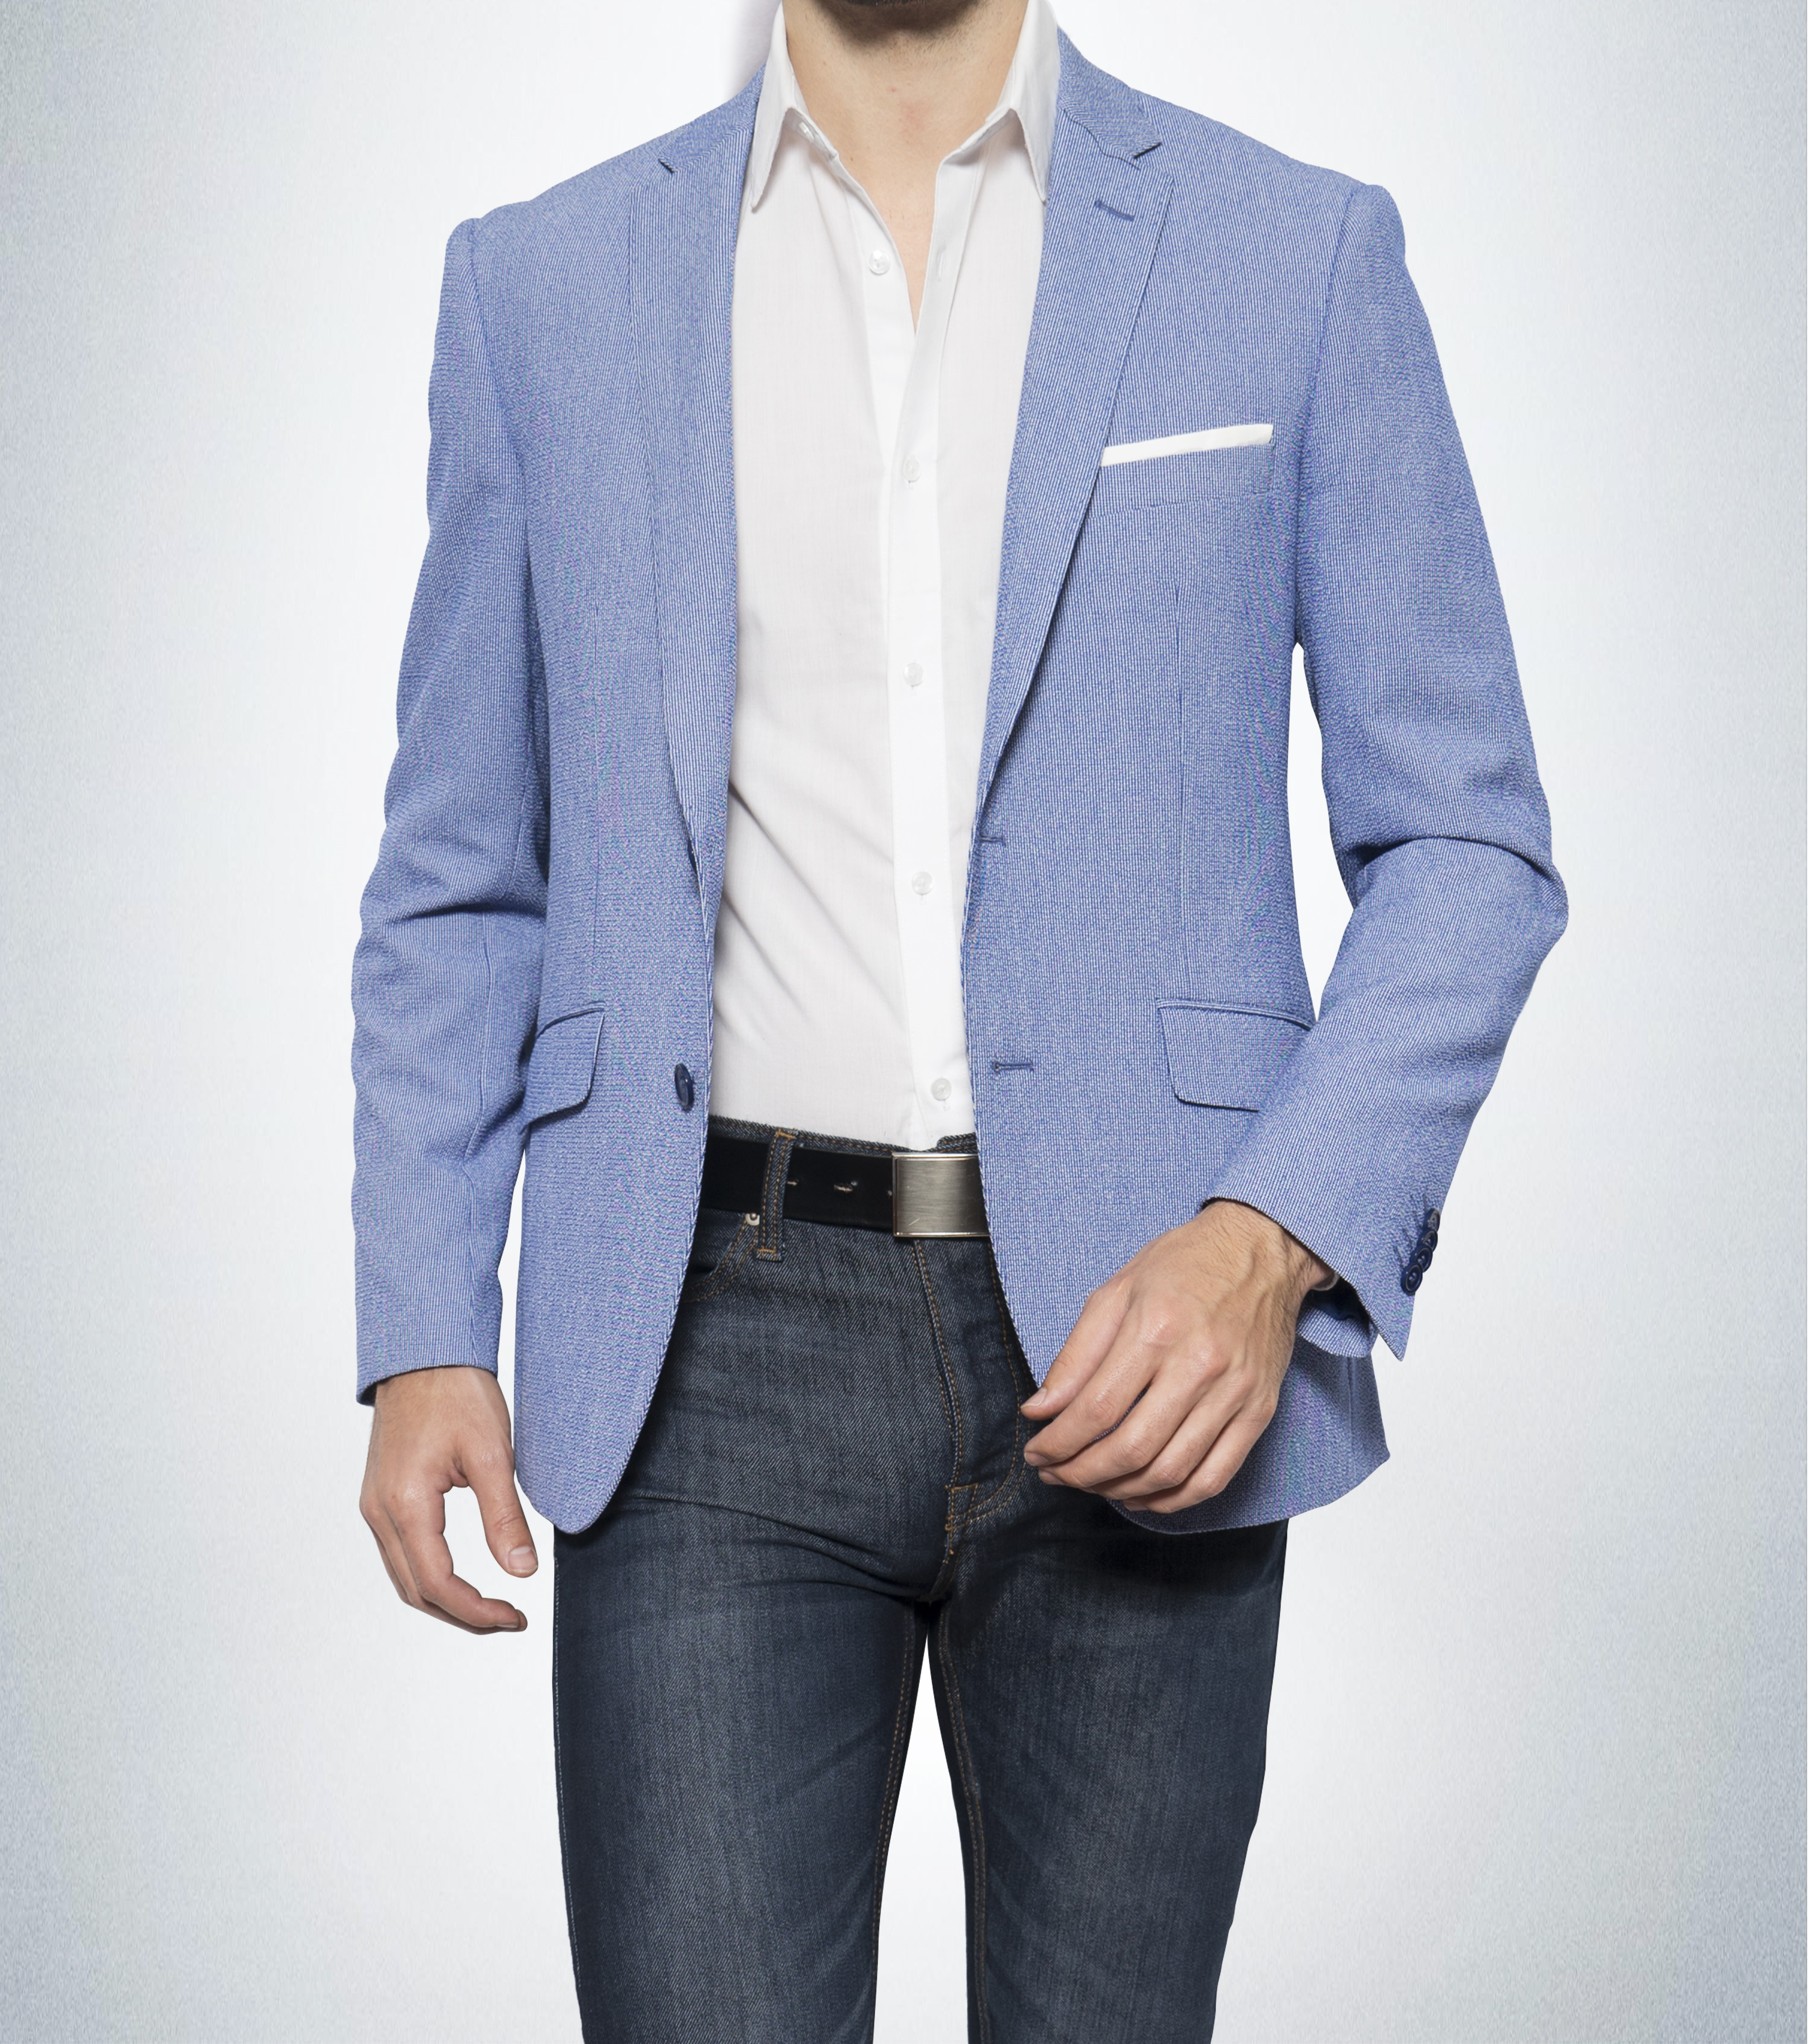 Light Blue Blazer Sports Jacket Mb18 C1670 1 Emmanuel